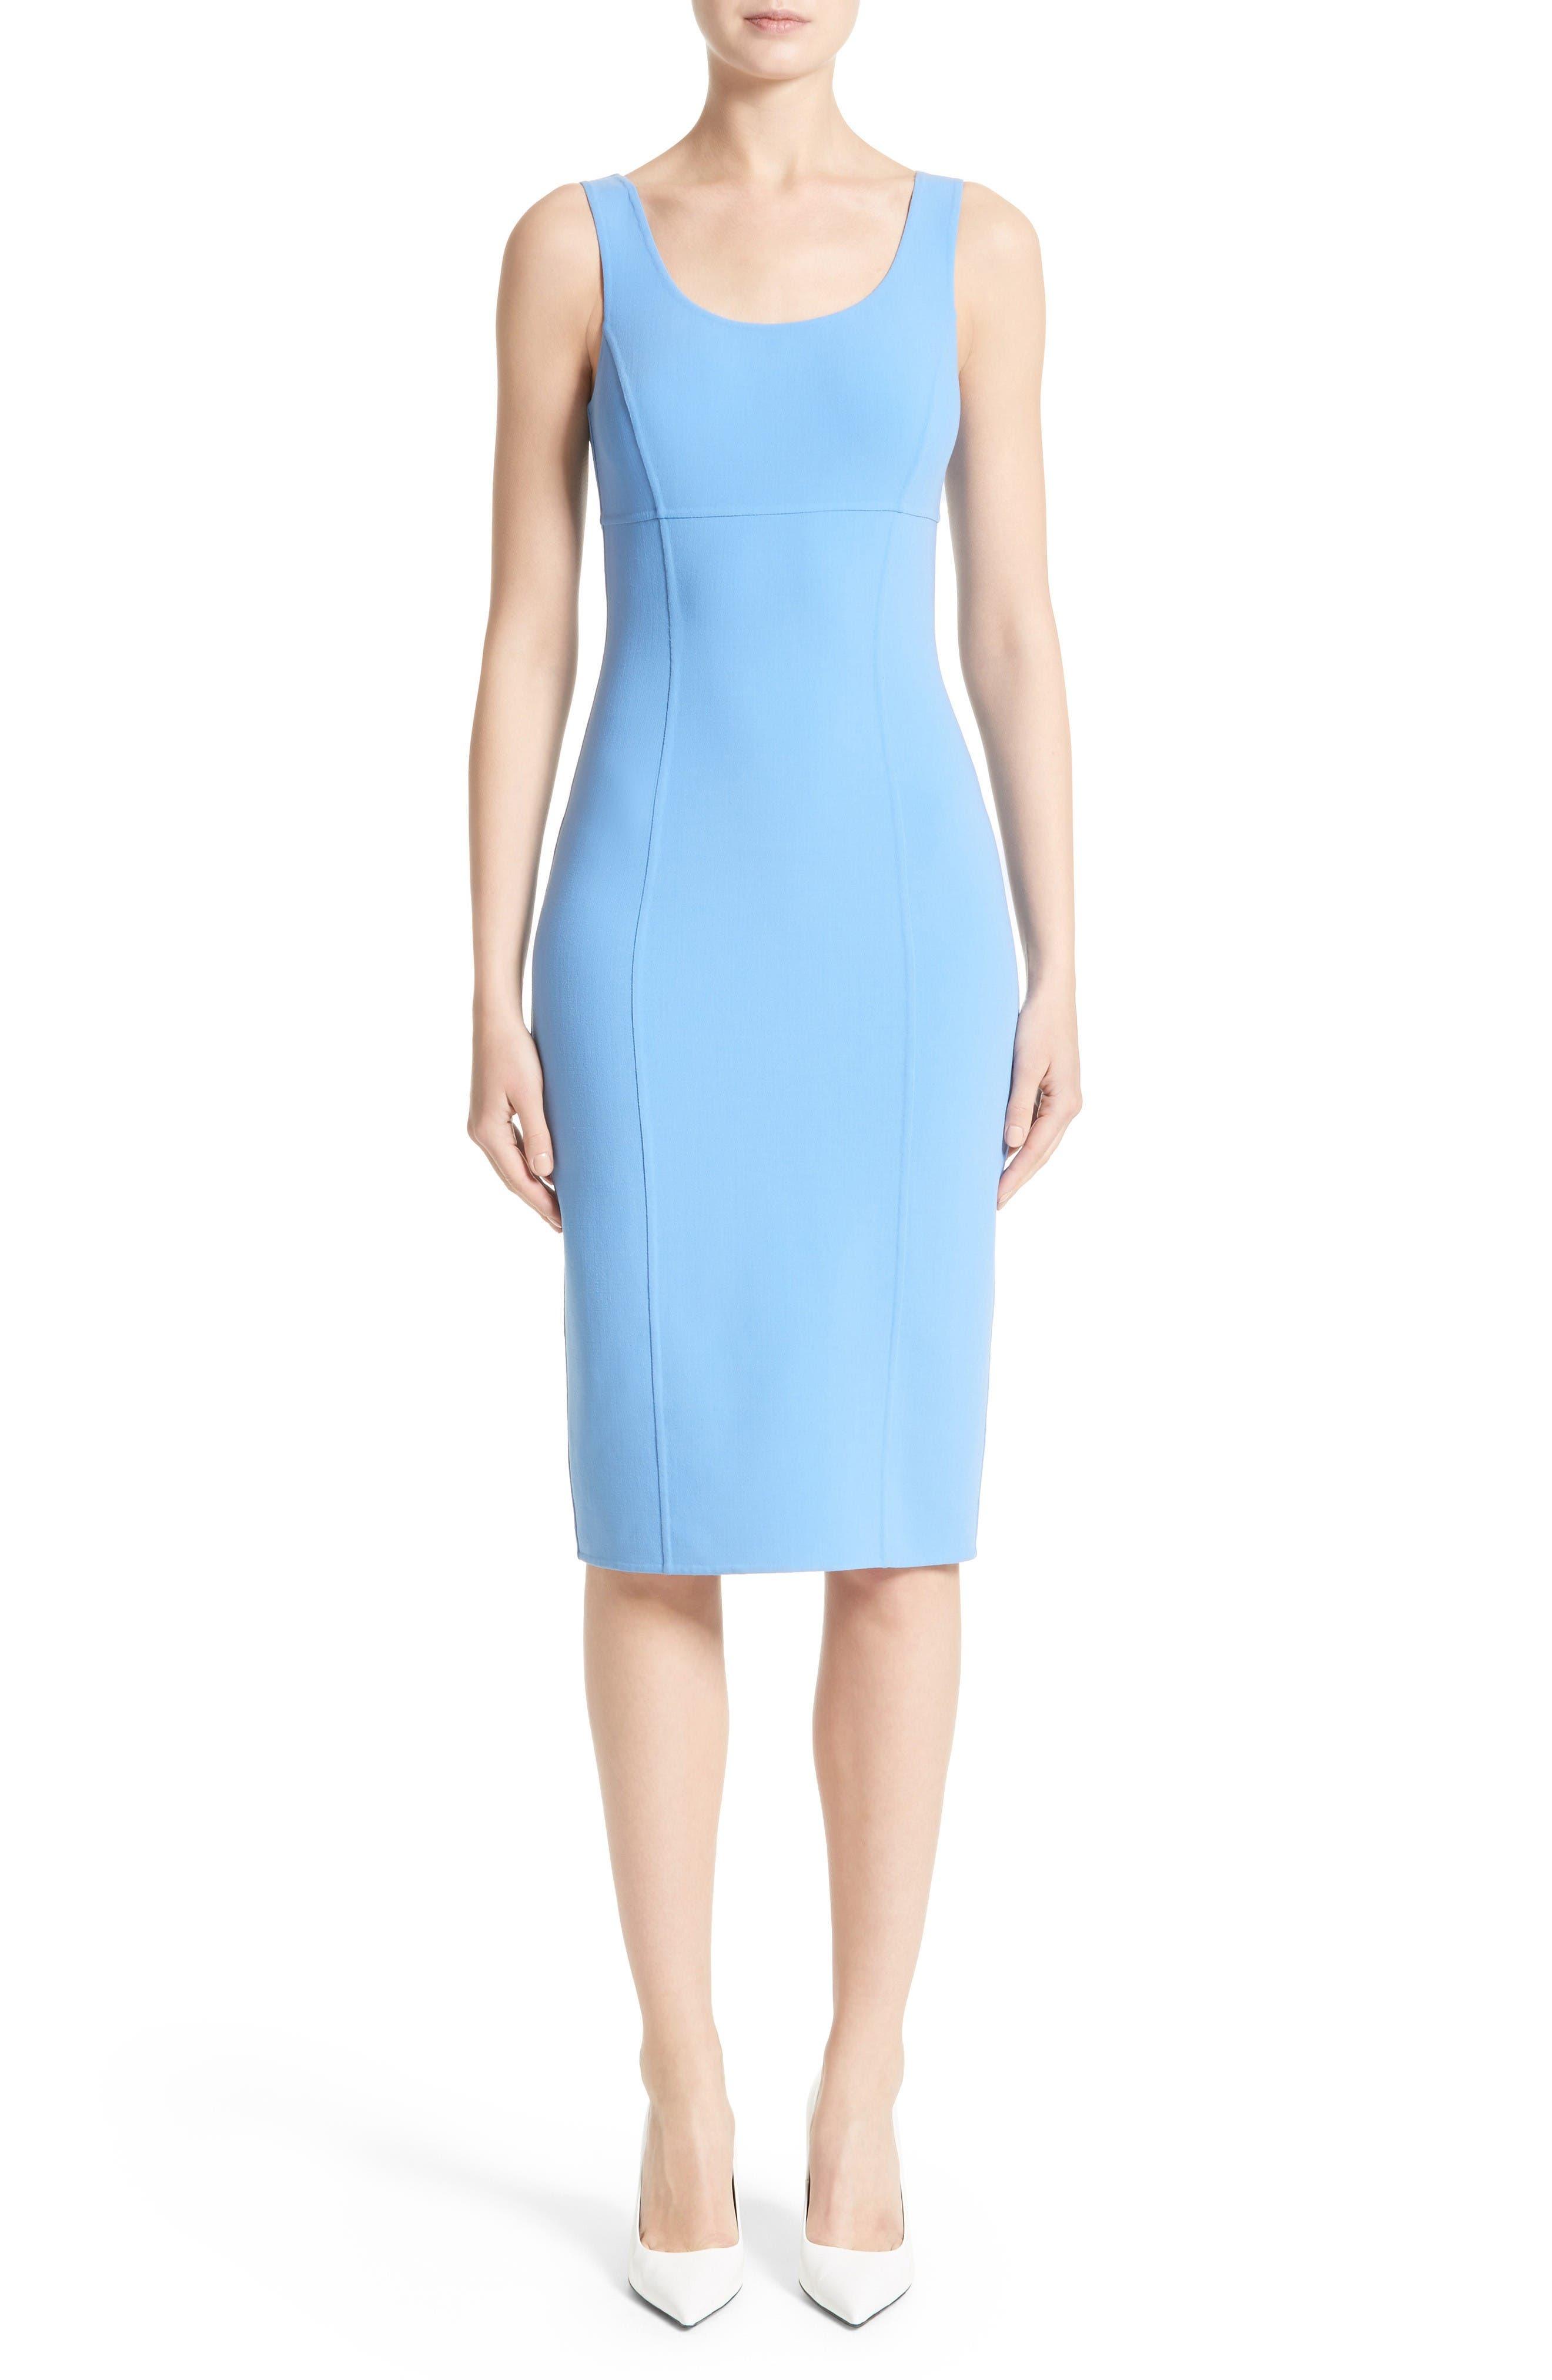 Alternate Image 1 Selected - Michael Kors Stretch Wool Crepe Sheath Dress